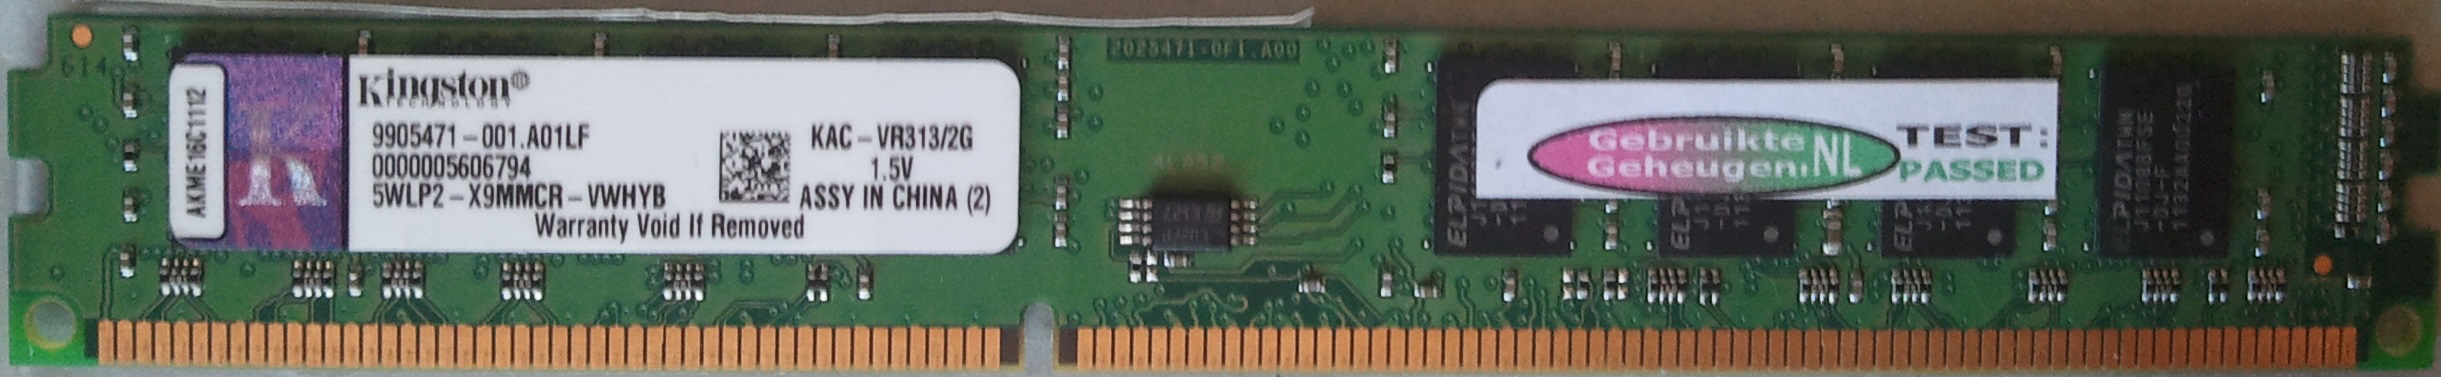 KAC-VR313/2GB